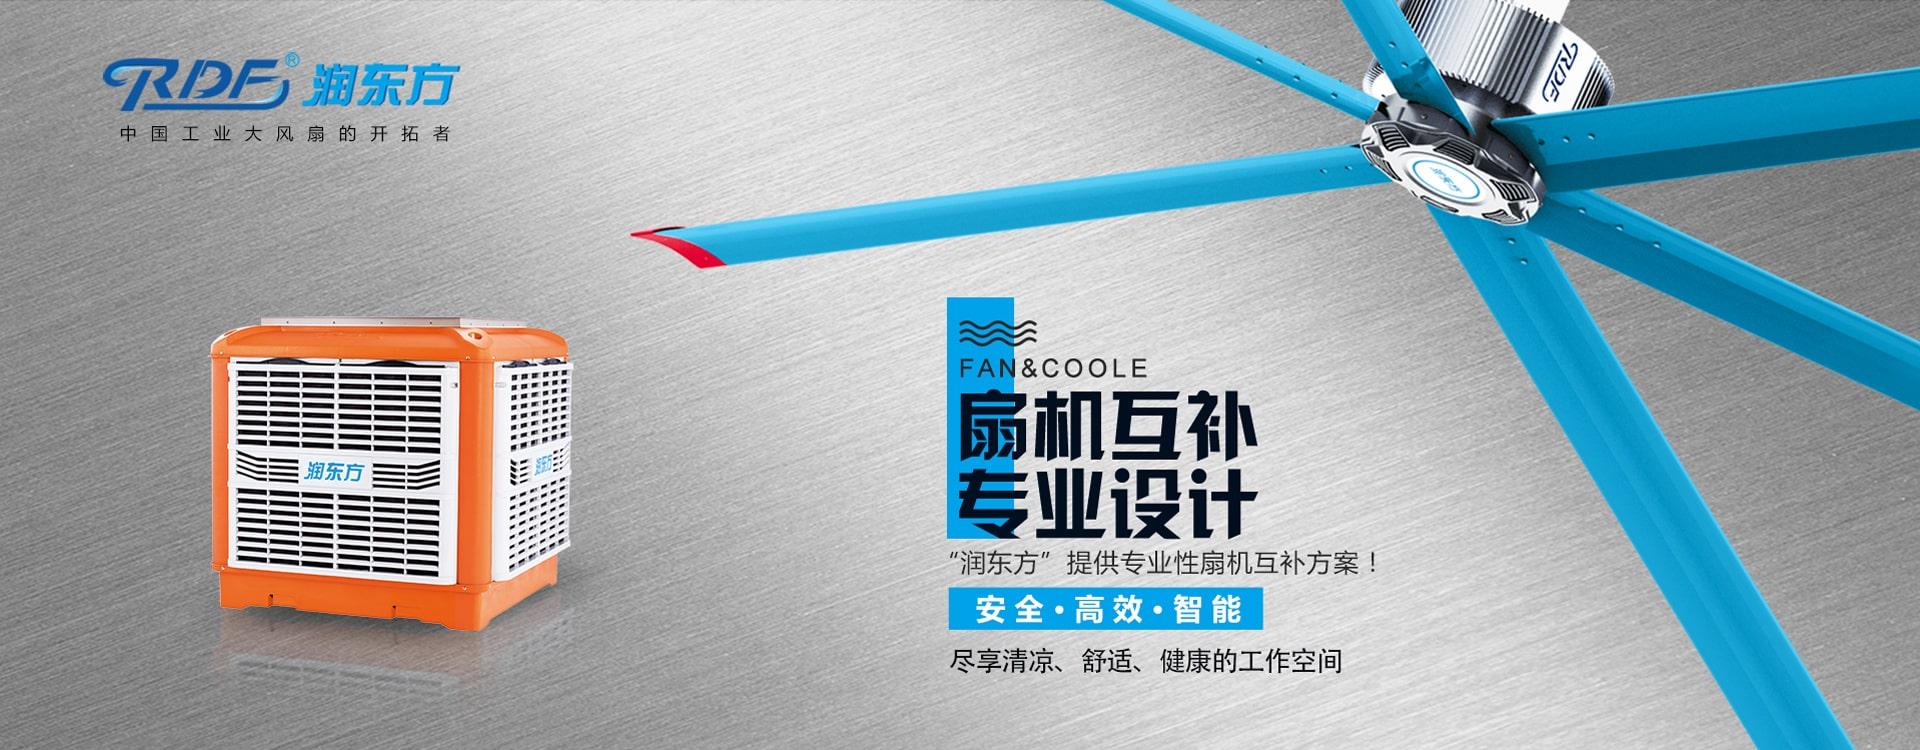 rdf-banner-202009-04-min